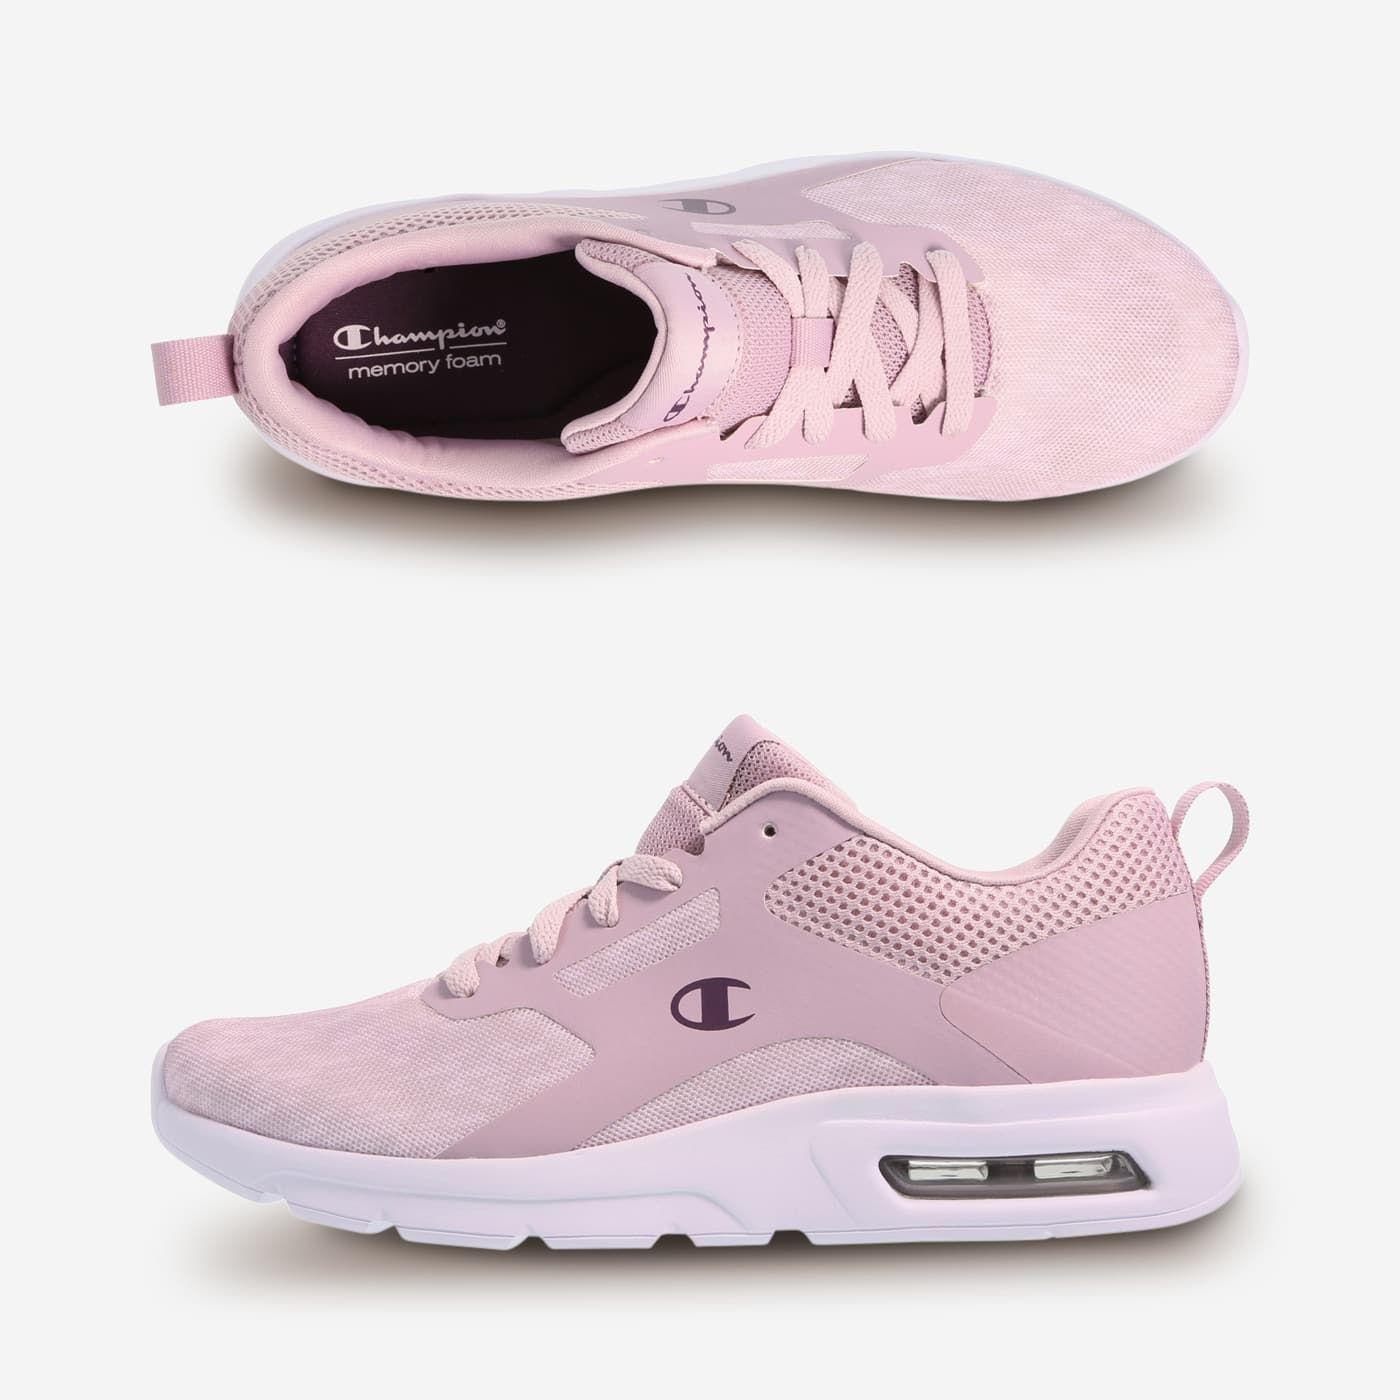 054aa490047 Champion Concur Women s Runner Shoe